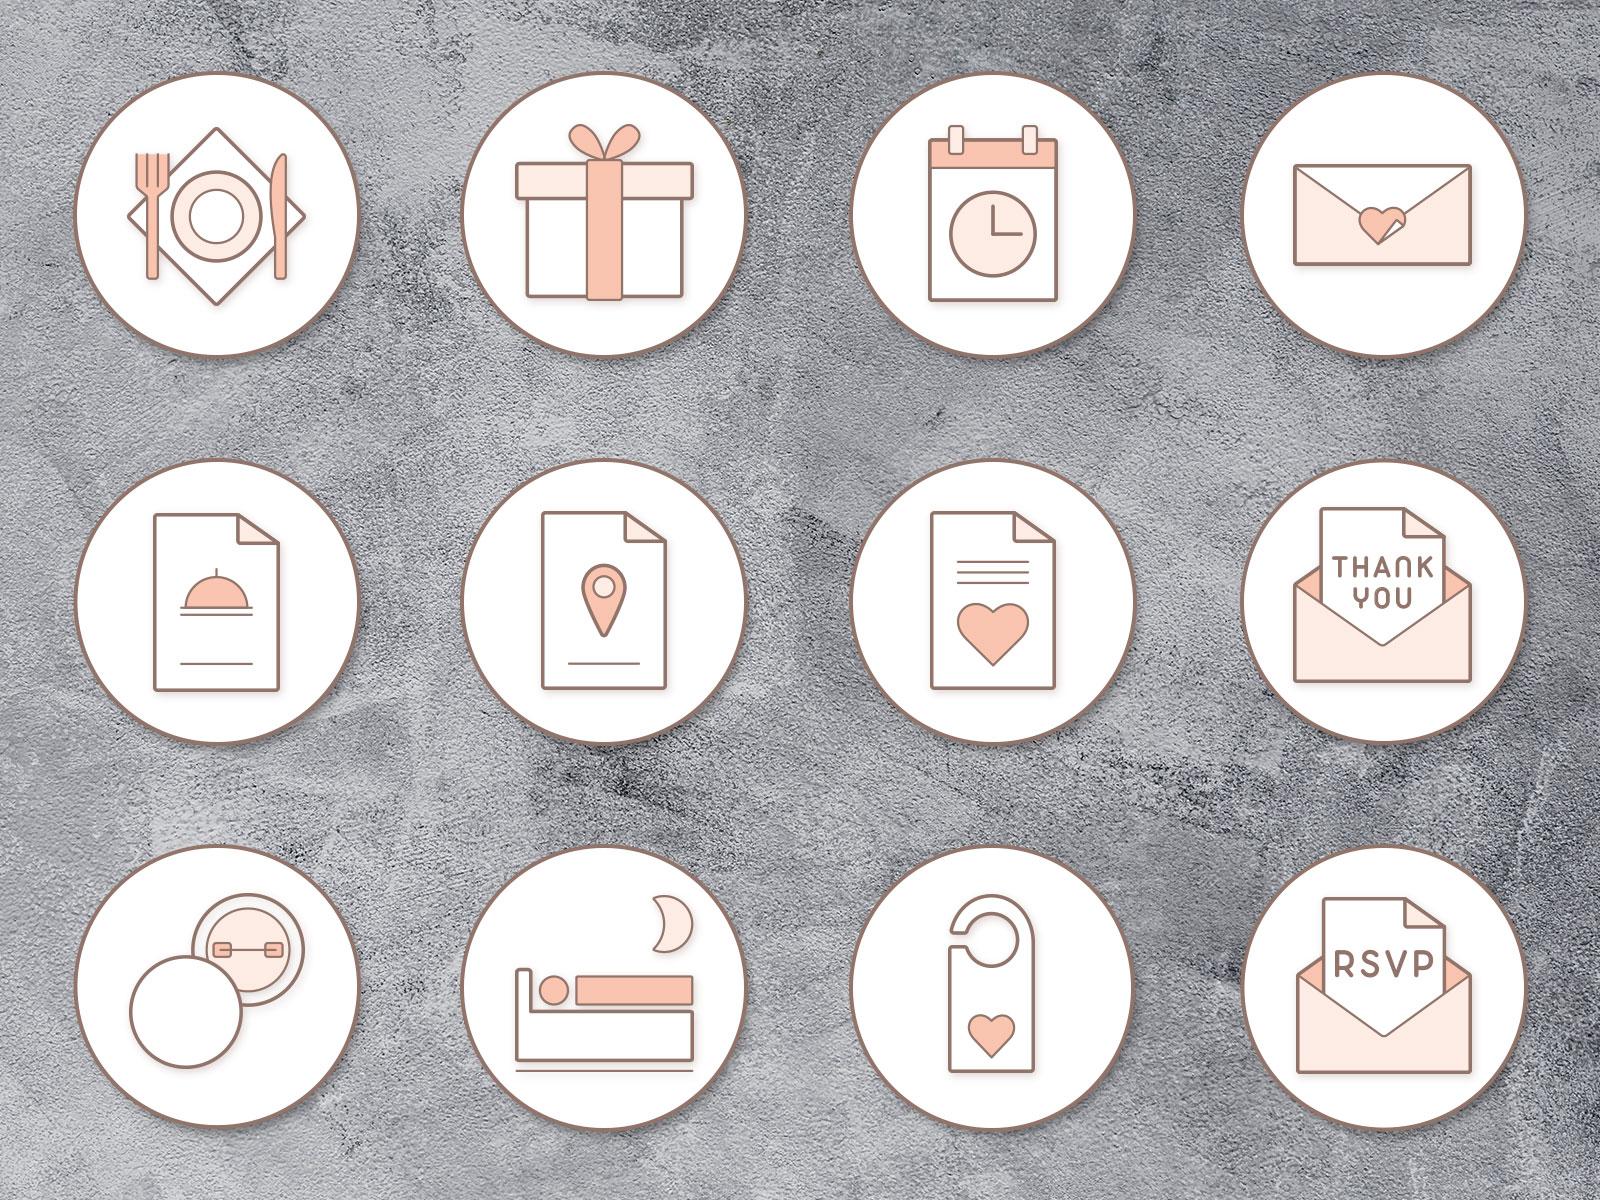 WhiteDesigns.cz - Tvorba ikon pro e-shop